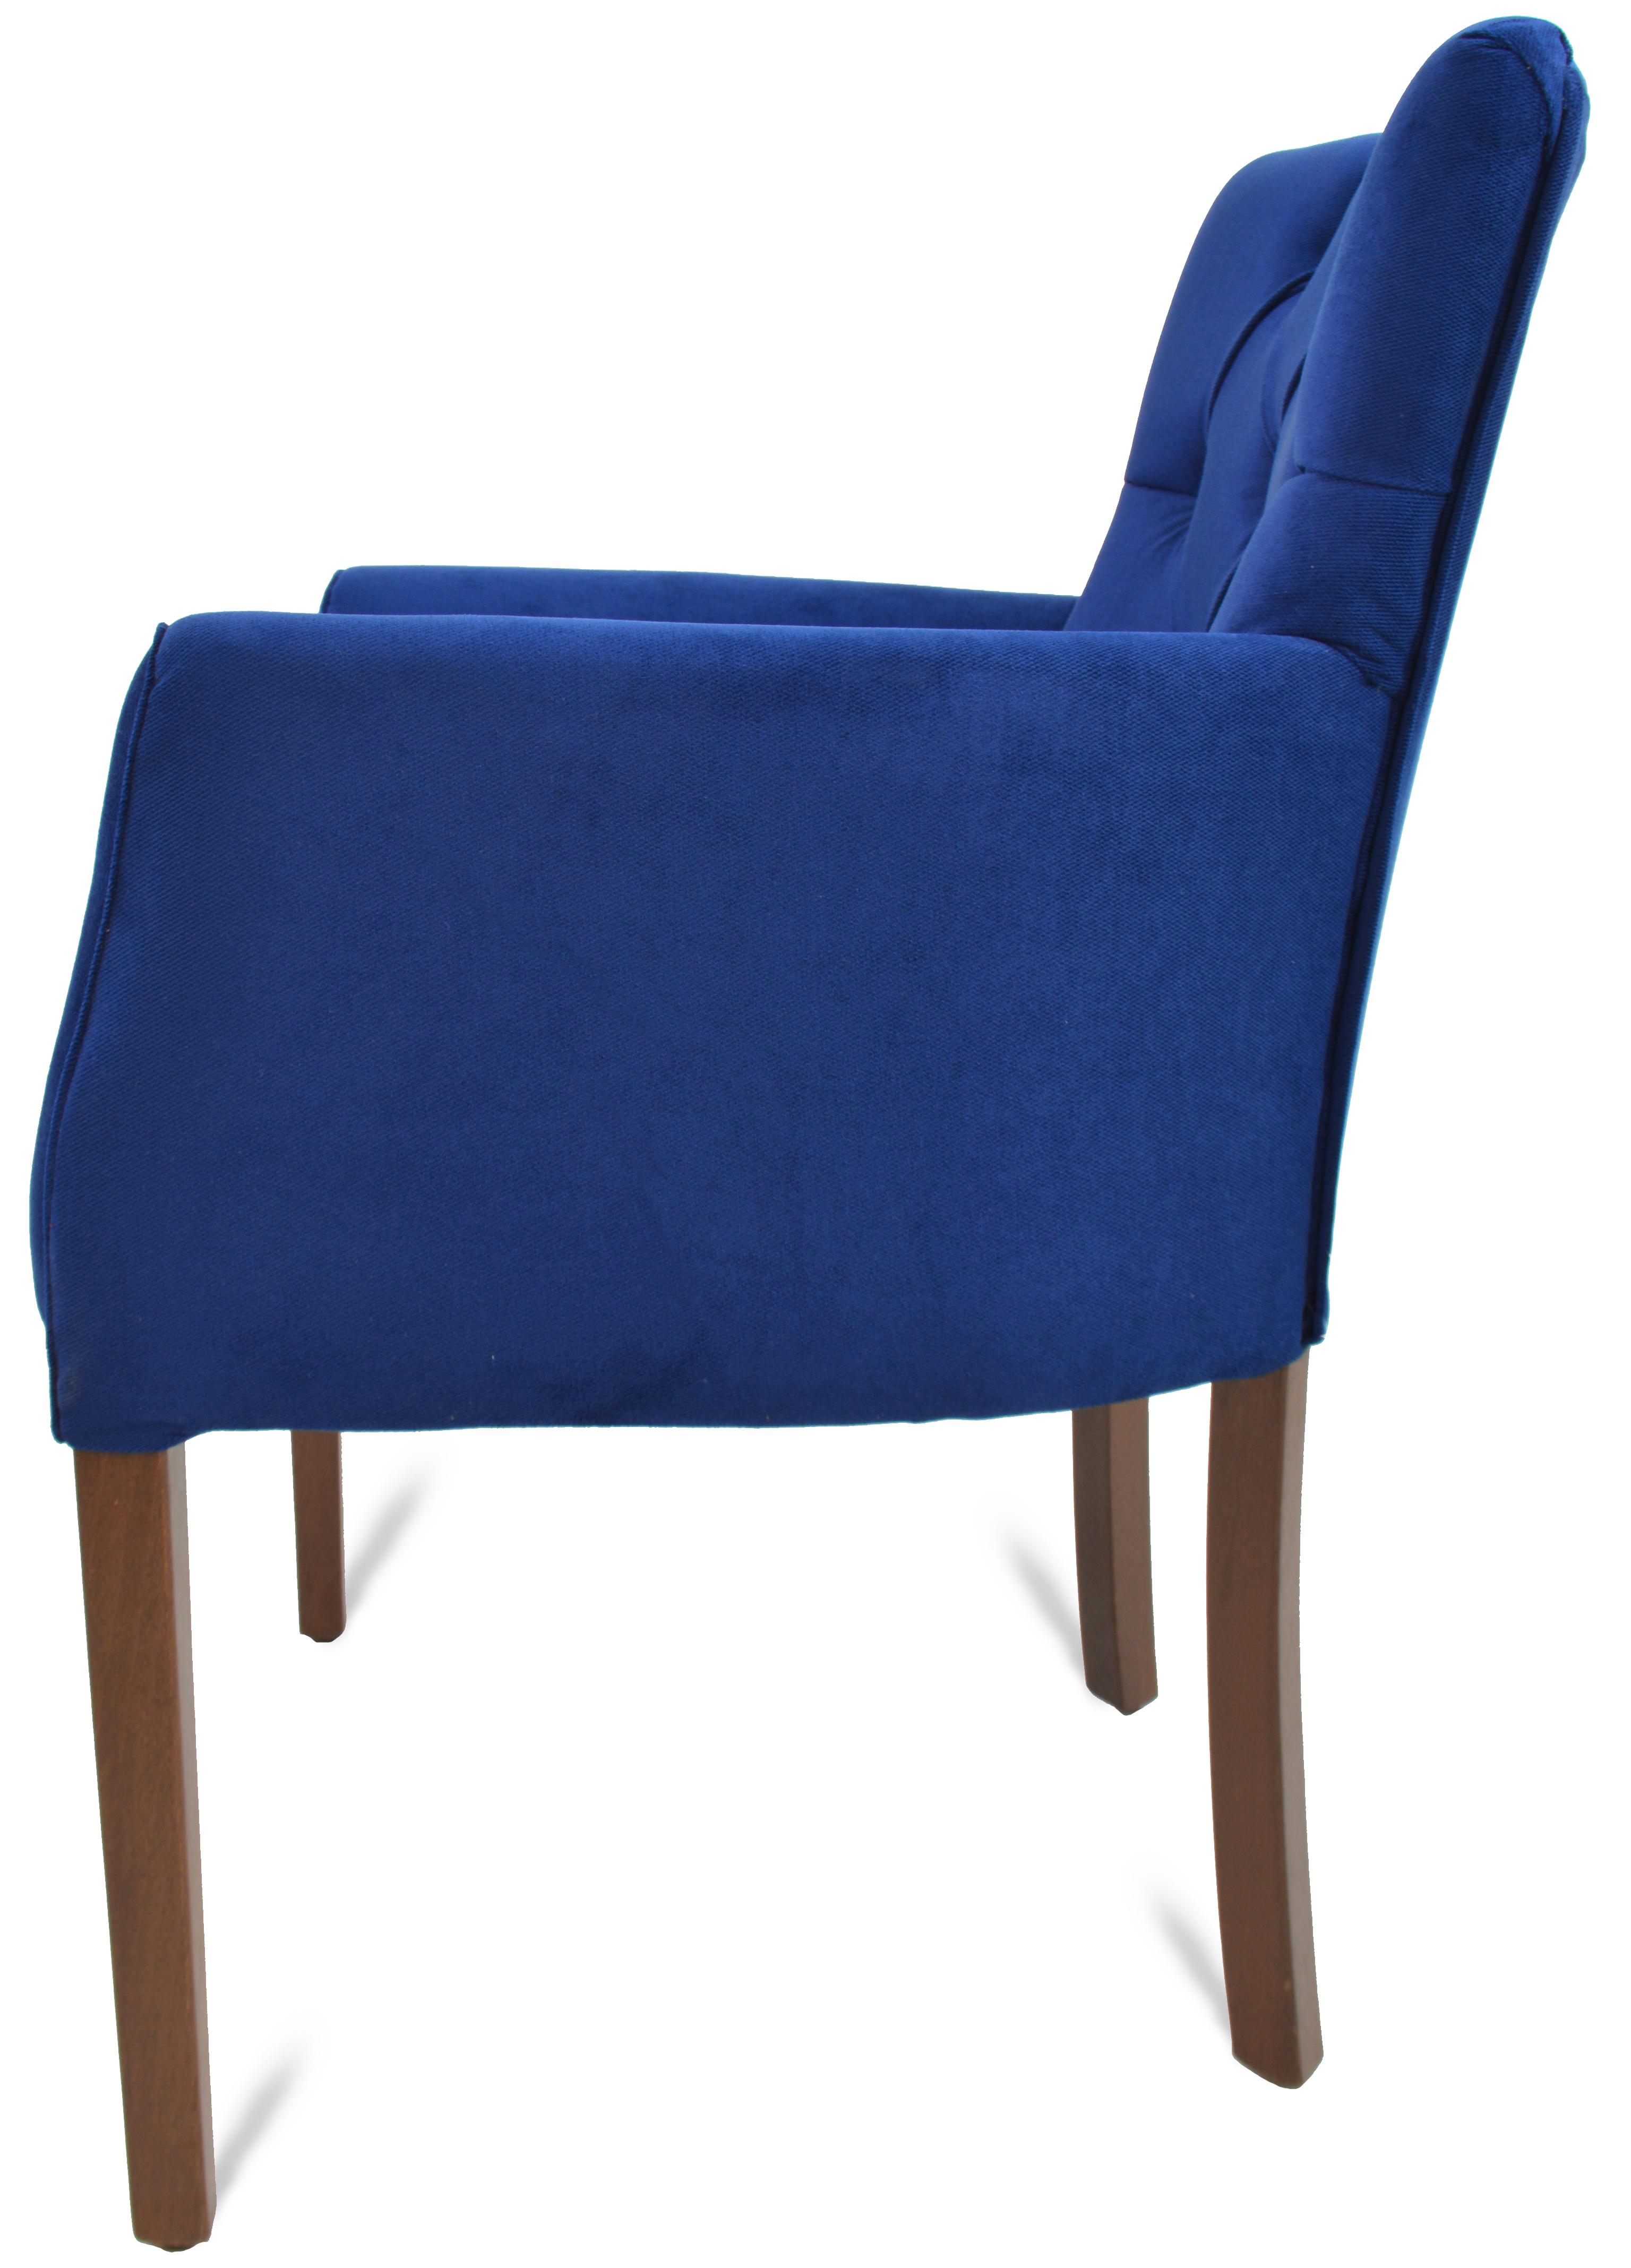 Lounge sessel stuhl kapitone blau mit armlehne g nstig for Sessel stuhl